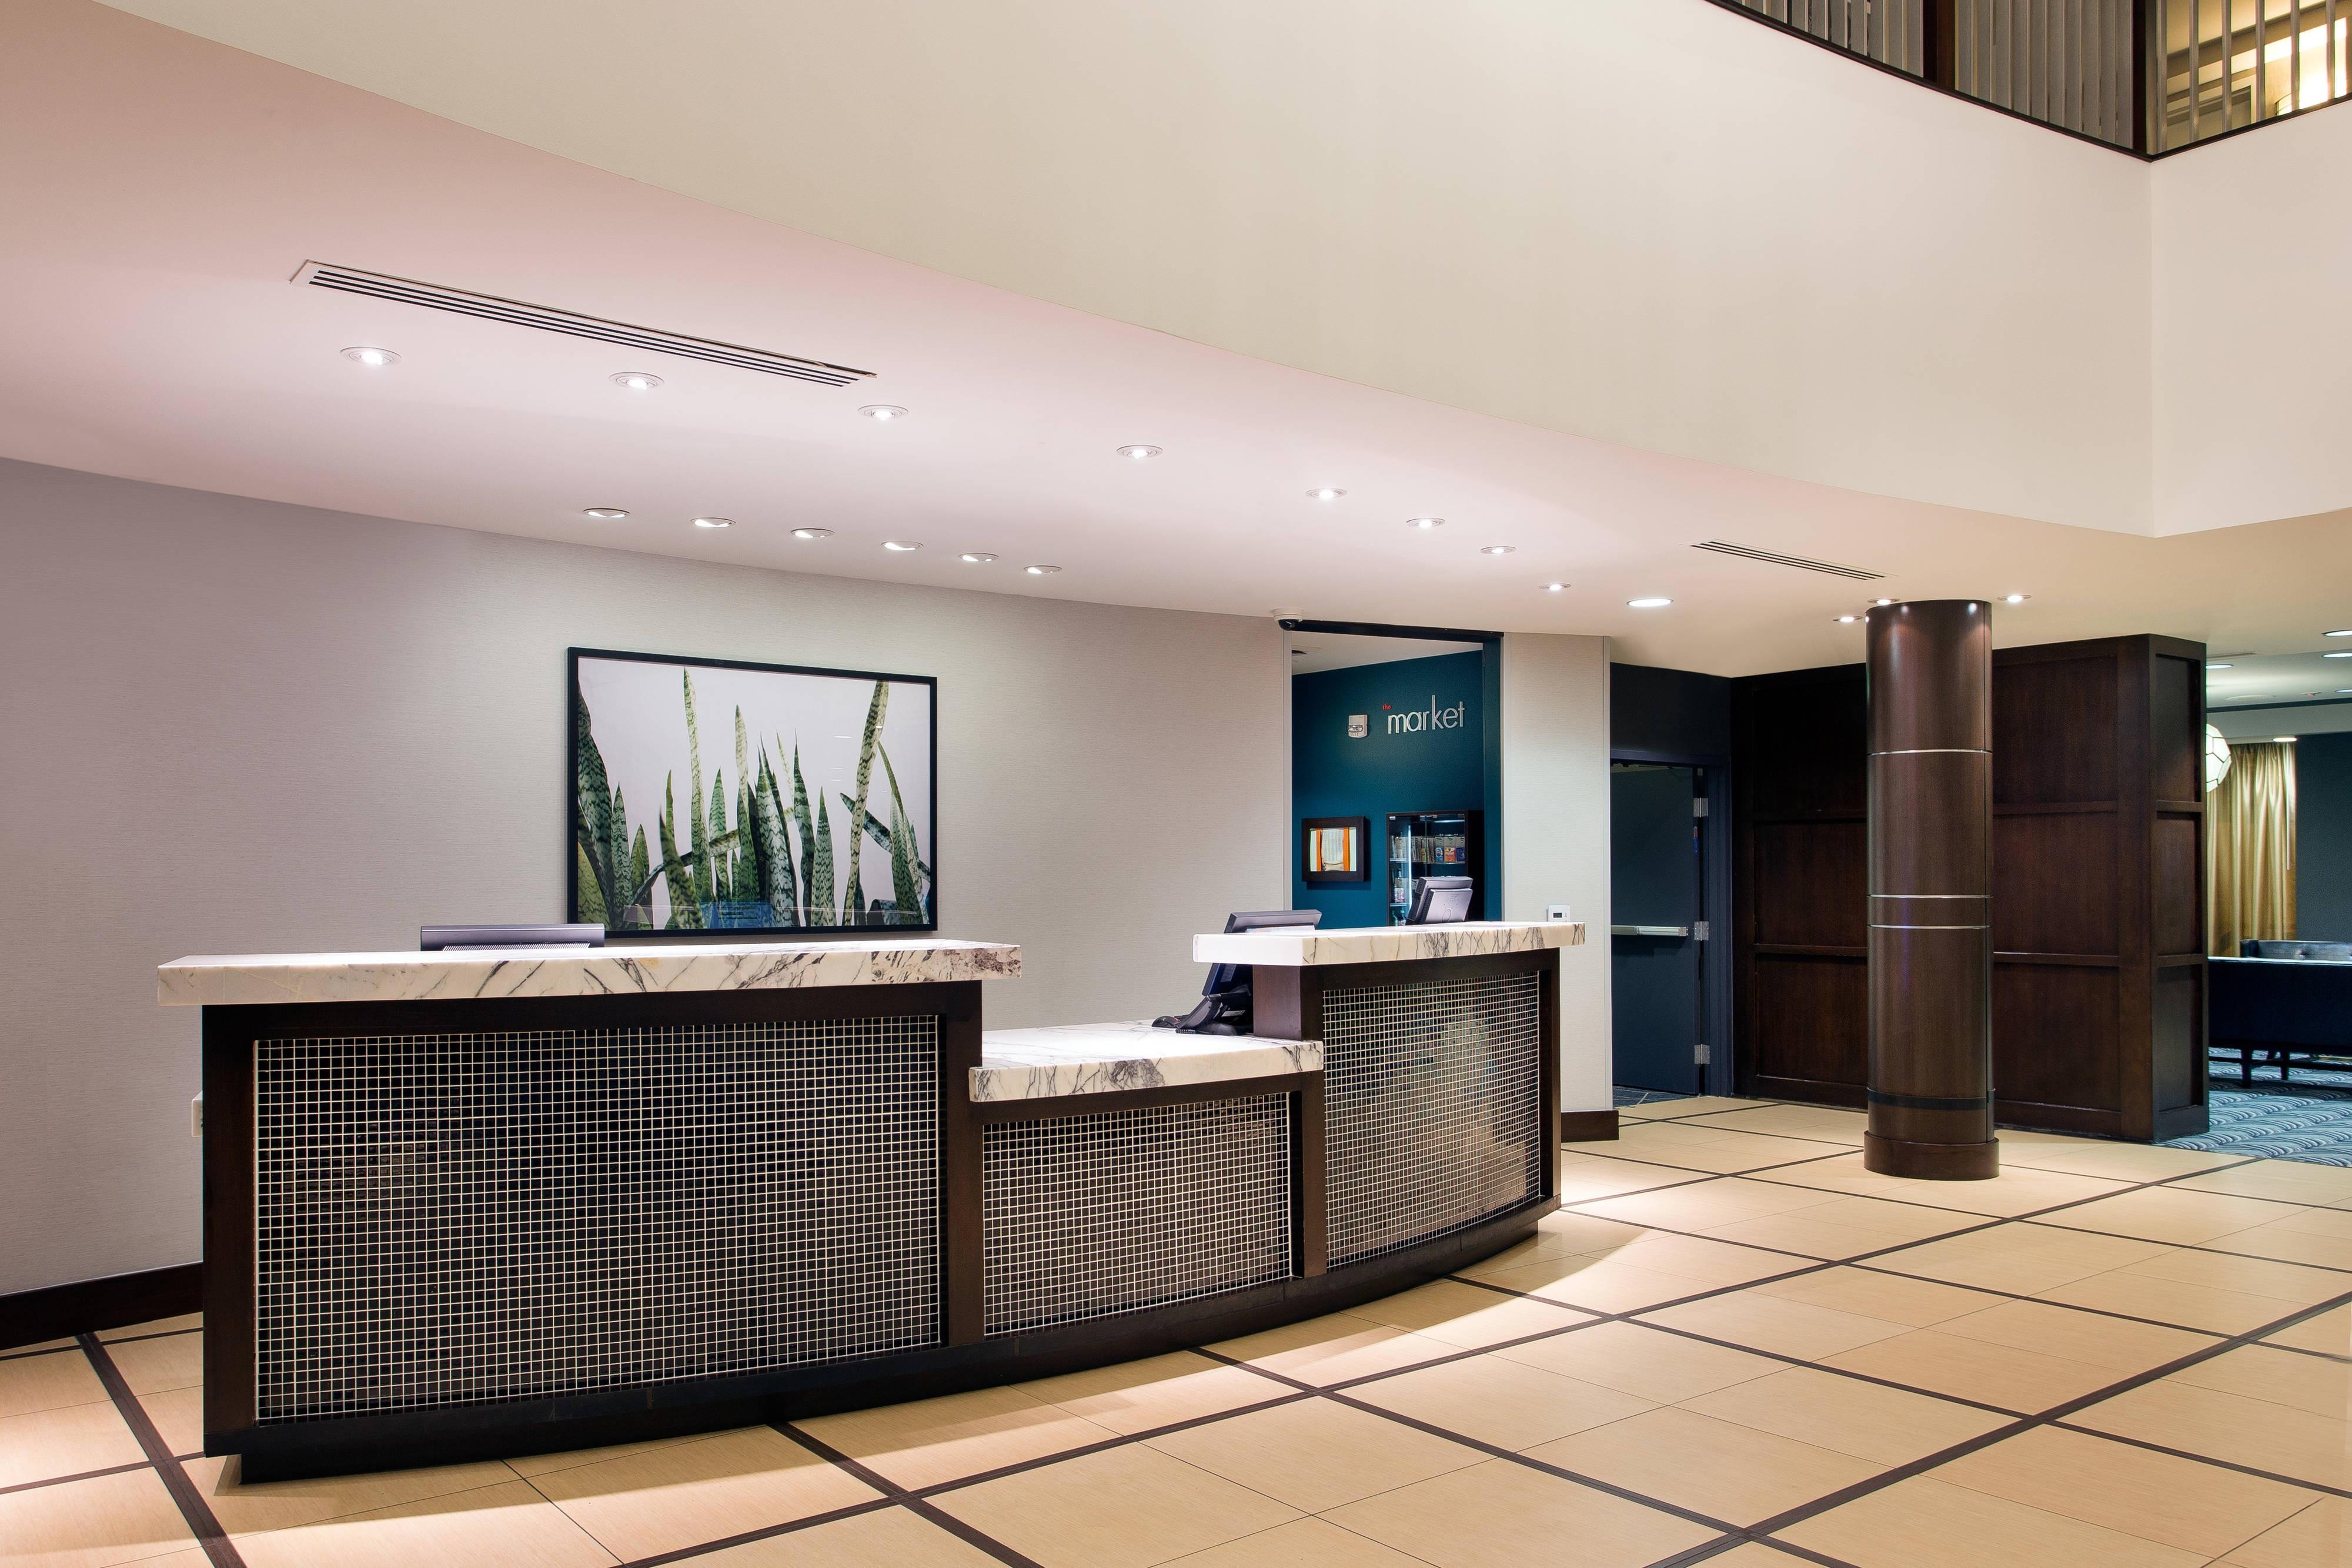 Burbank CA Hotel Front Desk